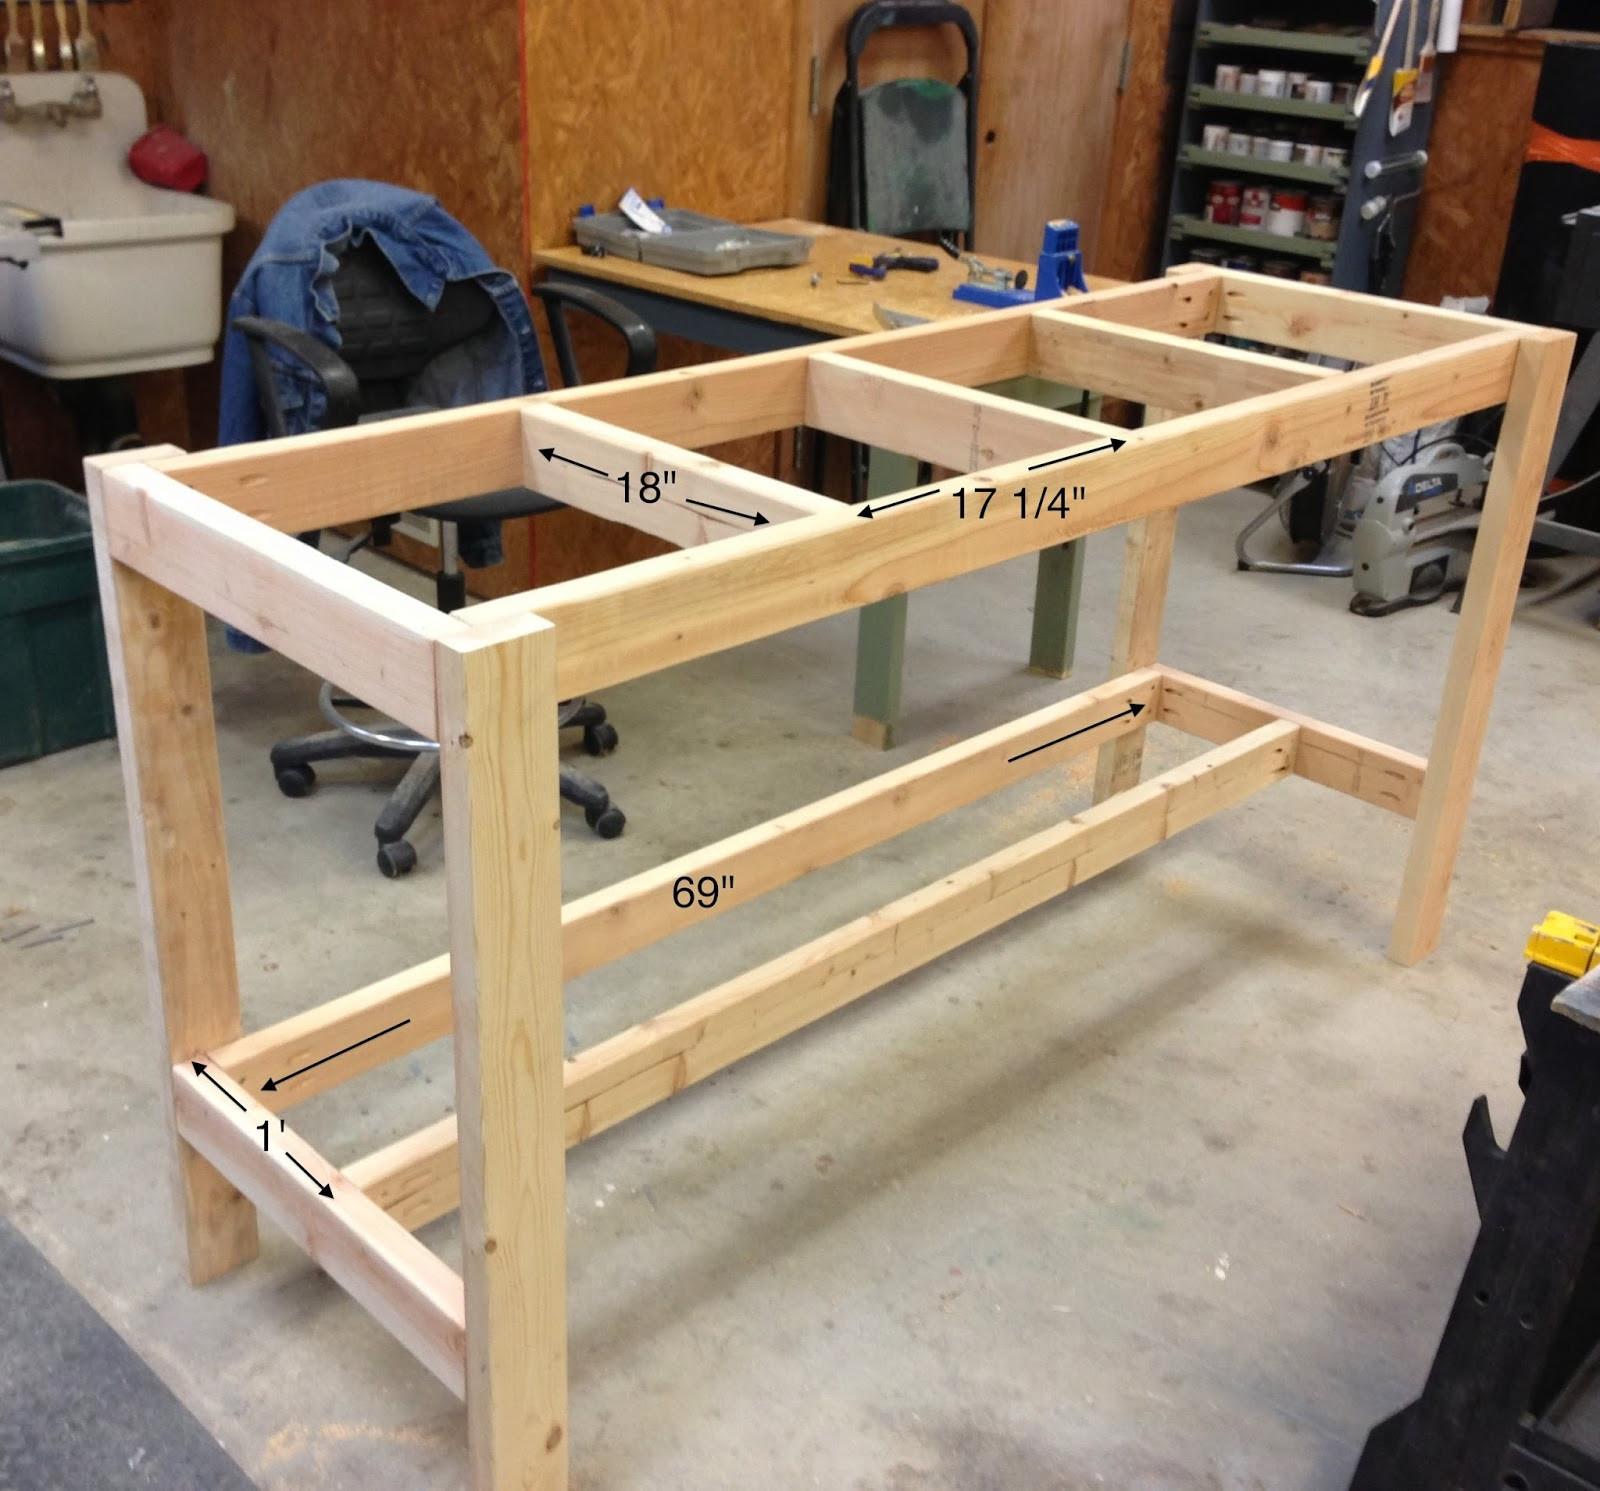 Workbench Plans DIY  Wilker Do s DIY Workbench